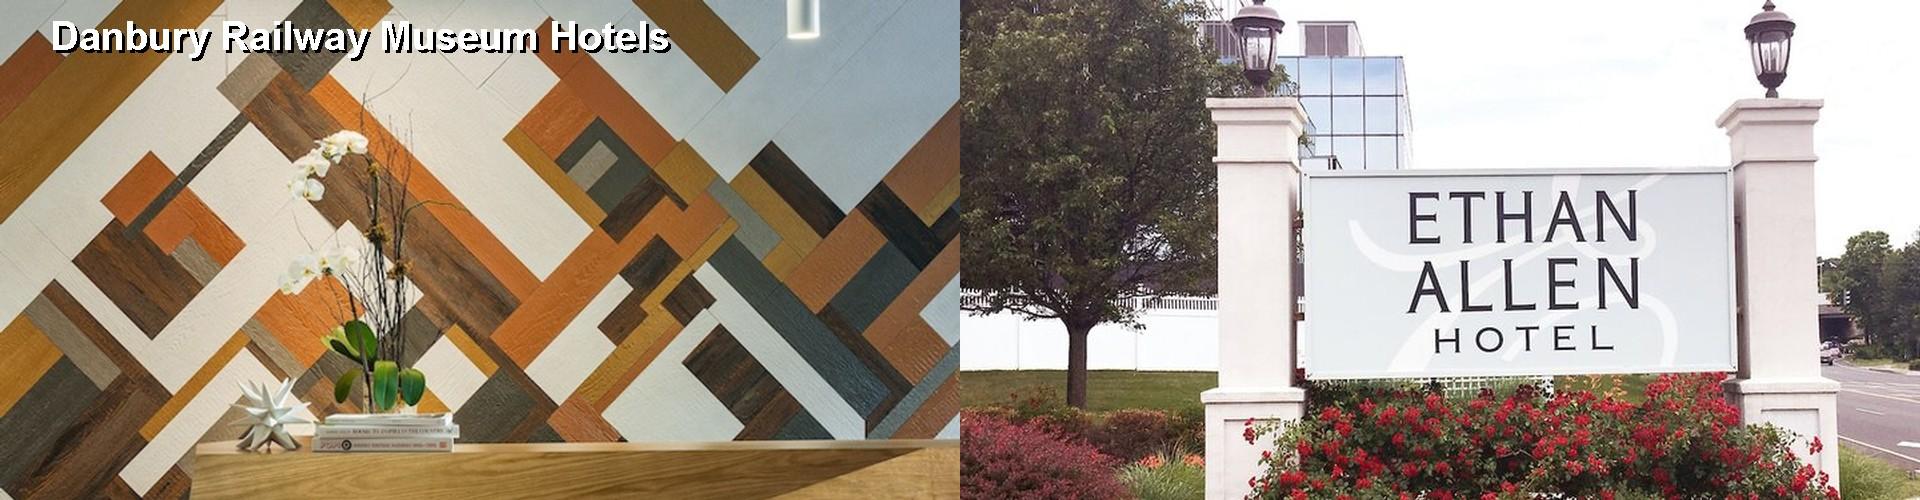 5 Best Hotels Near Danbury Railway Museum